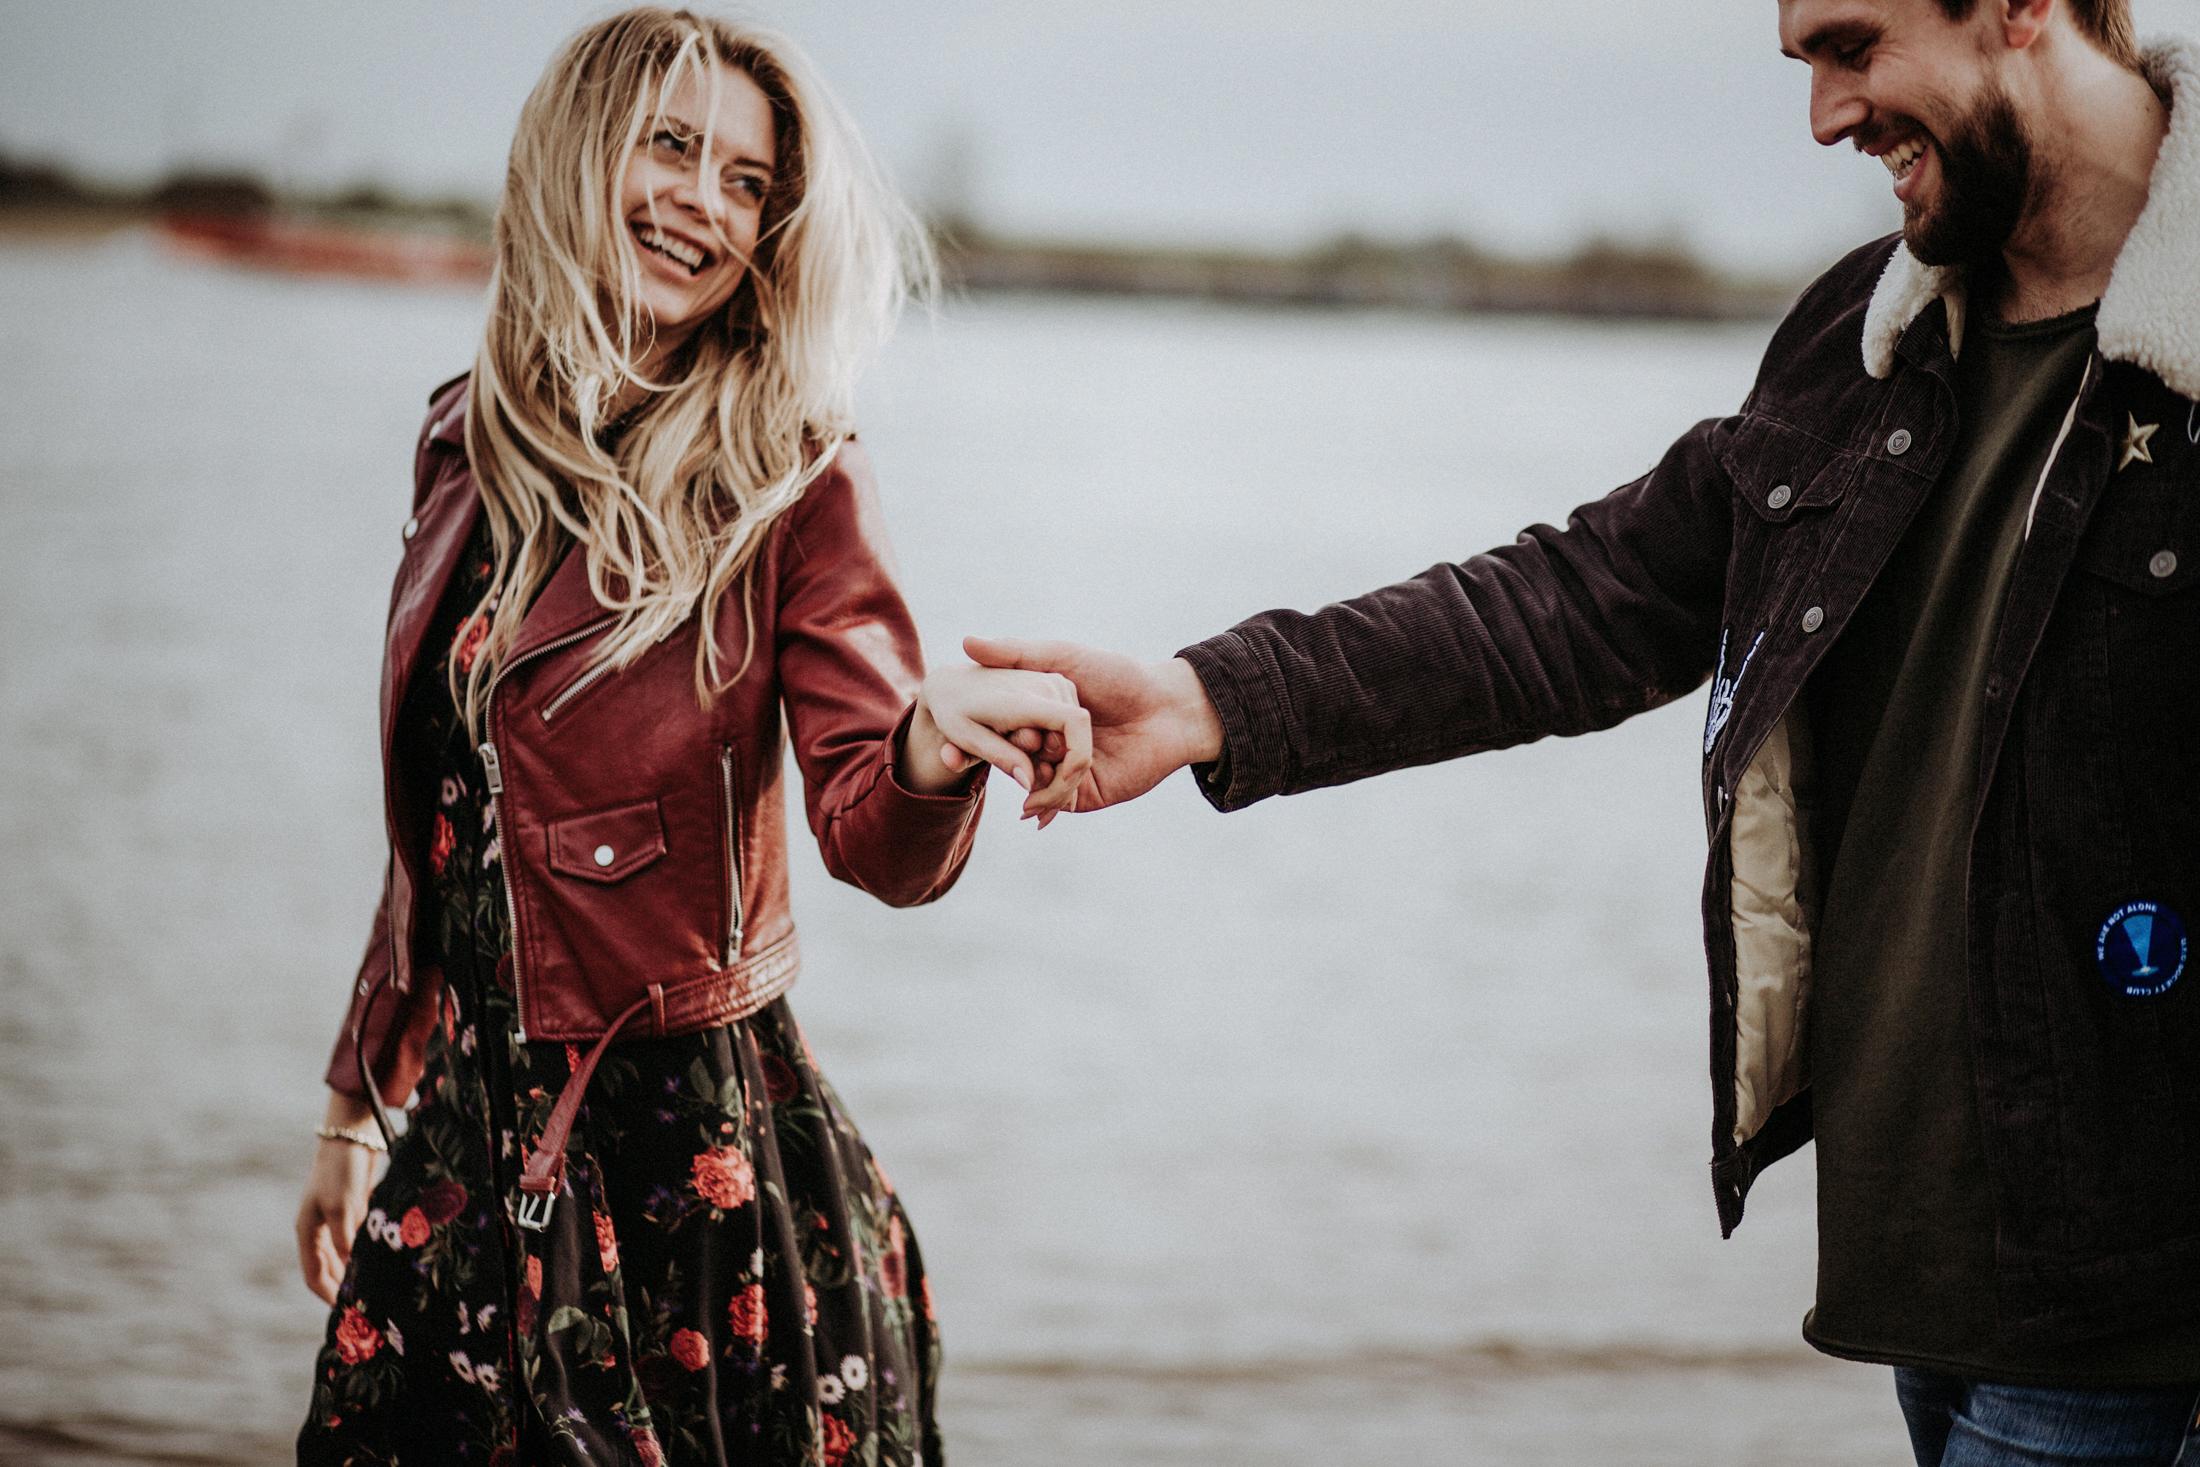 Wedding_Photographer_Mallorca_DanielaMarquardt_Photography_CanaryIslands_Lanzarote_Iceland_Tuscany_Santorini_Portugal_NewYork_Spain_Elopement_Hochzeitsfotograf_CK95